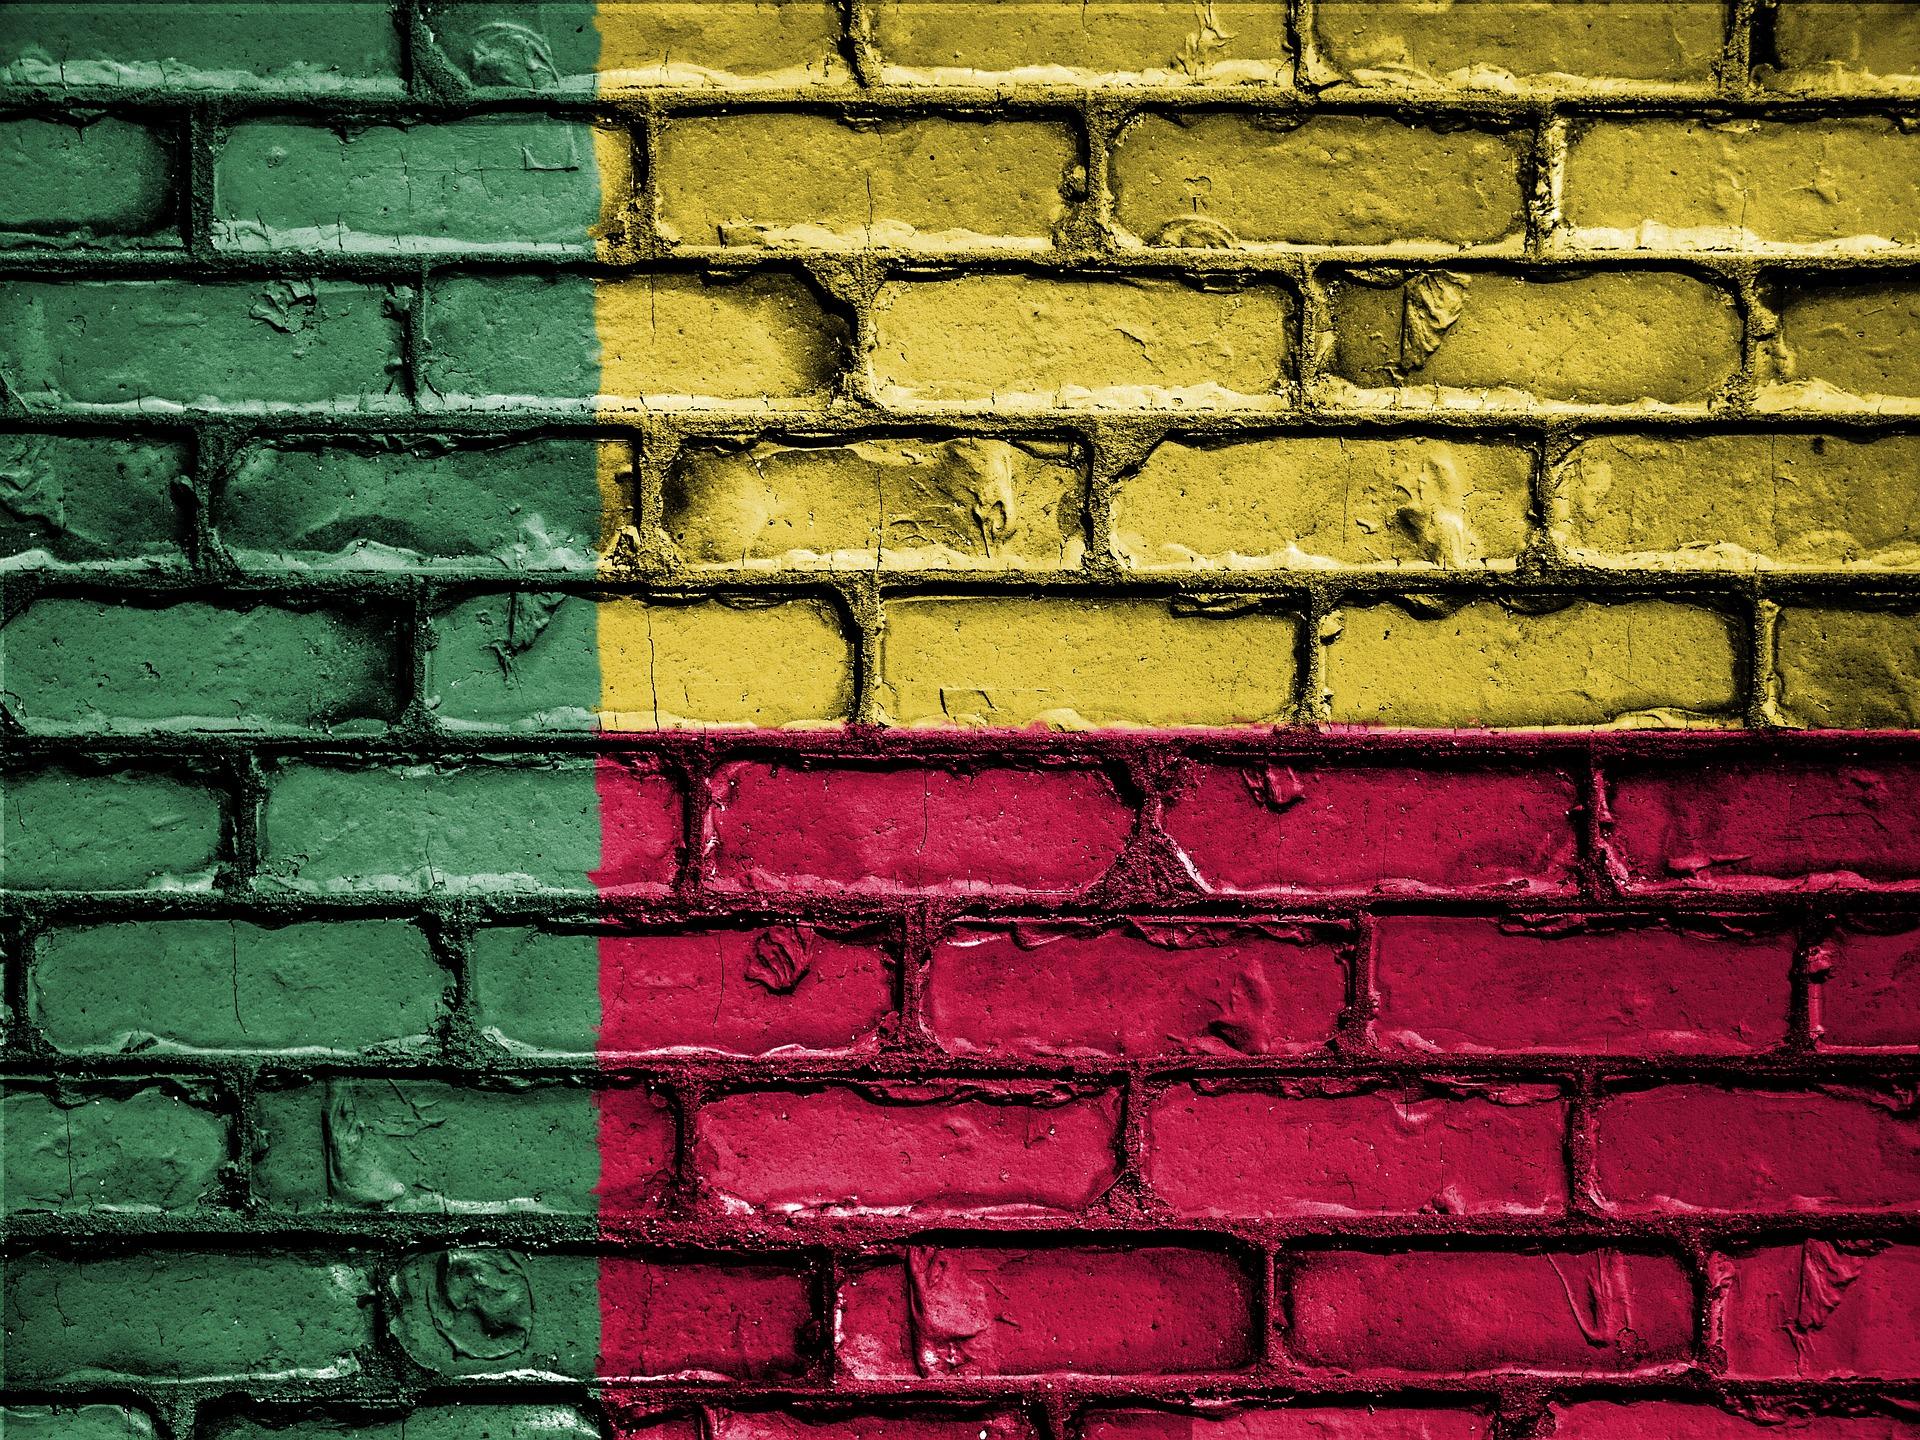 Benin flag painted on brick wall